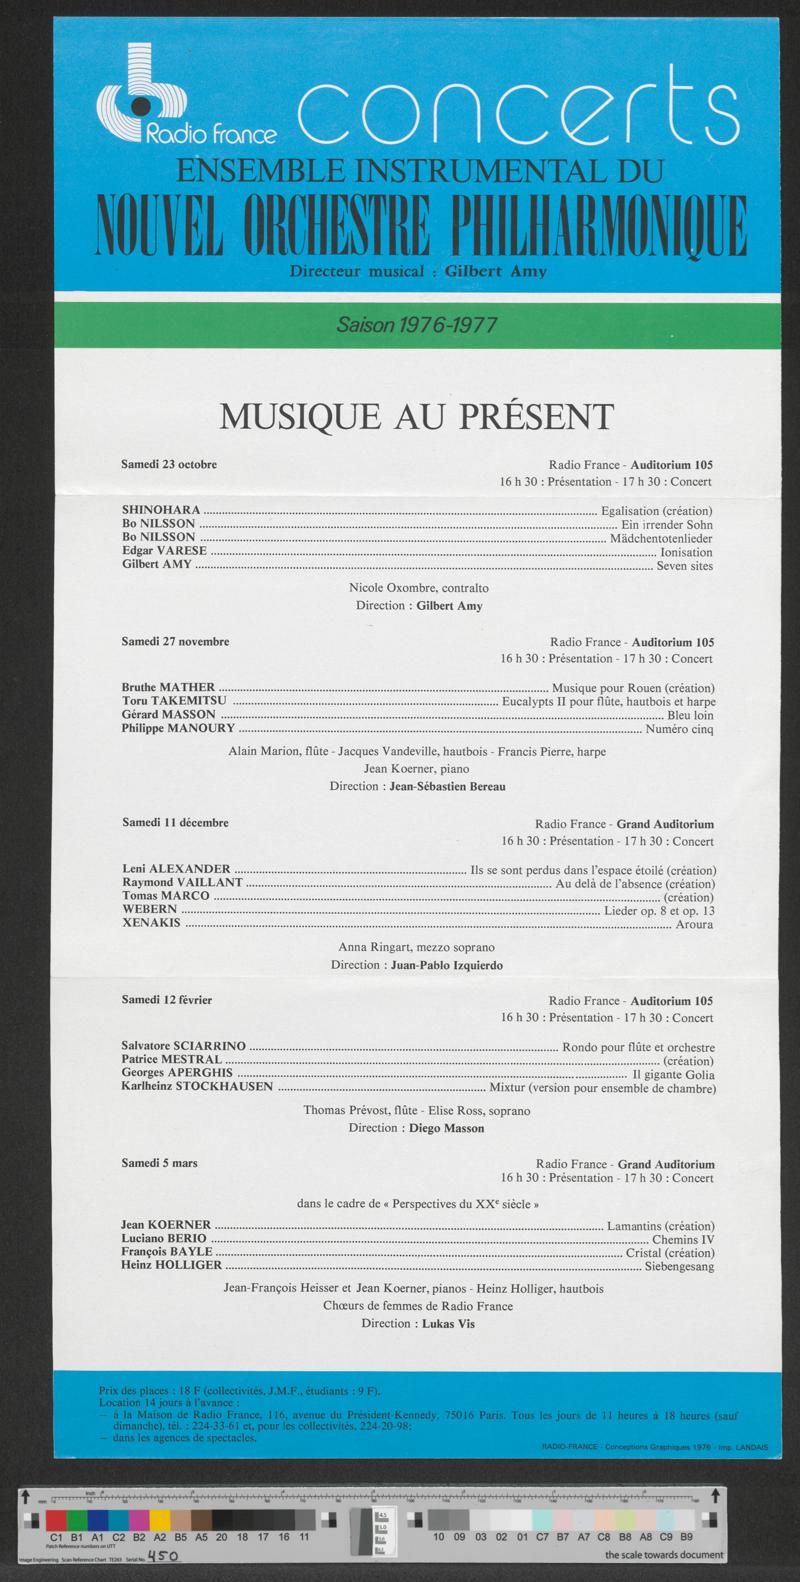 Flyer: Radio France Concerts, Saison 1976-1977